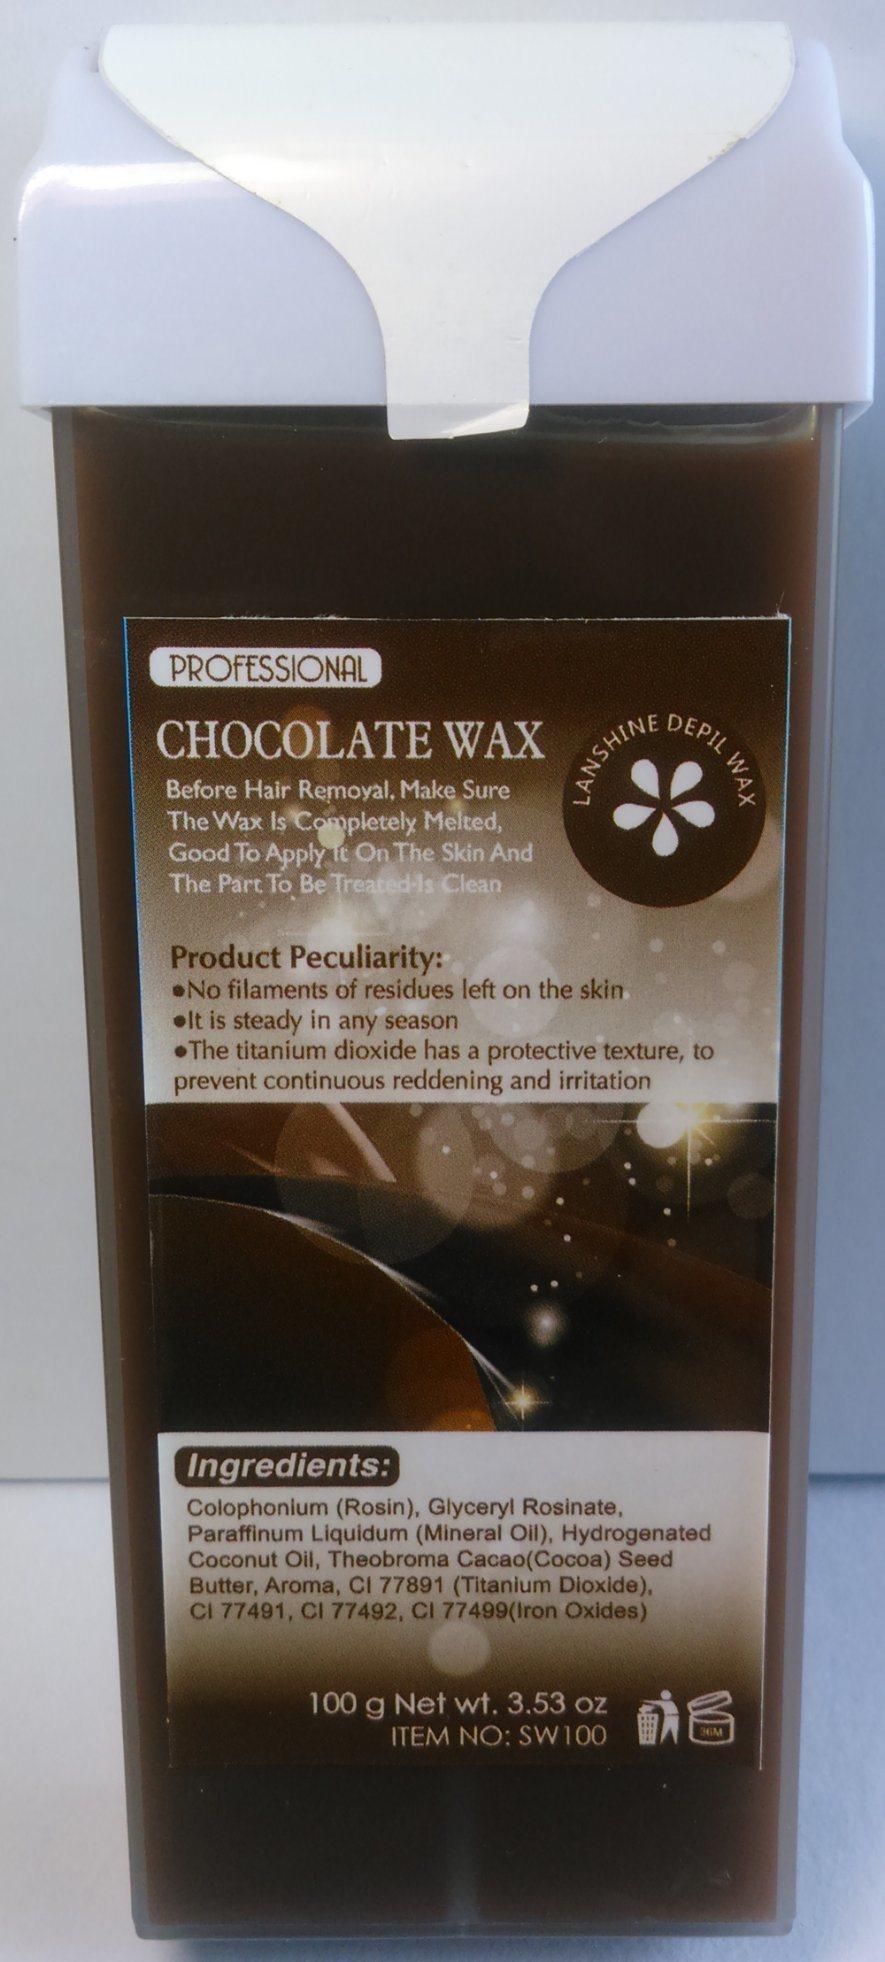 Roll-on Depilatory Wax Chocolate Creme Wax